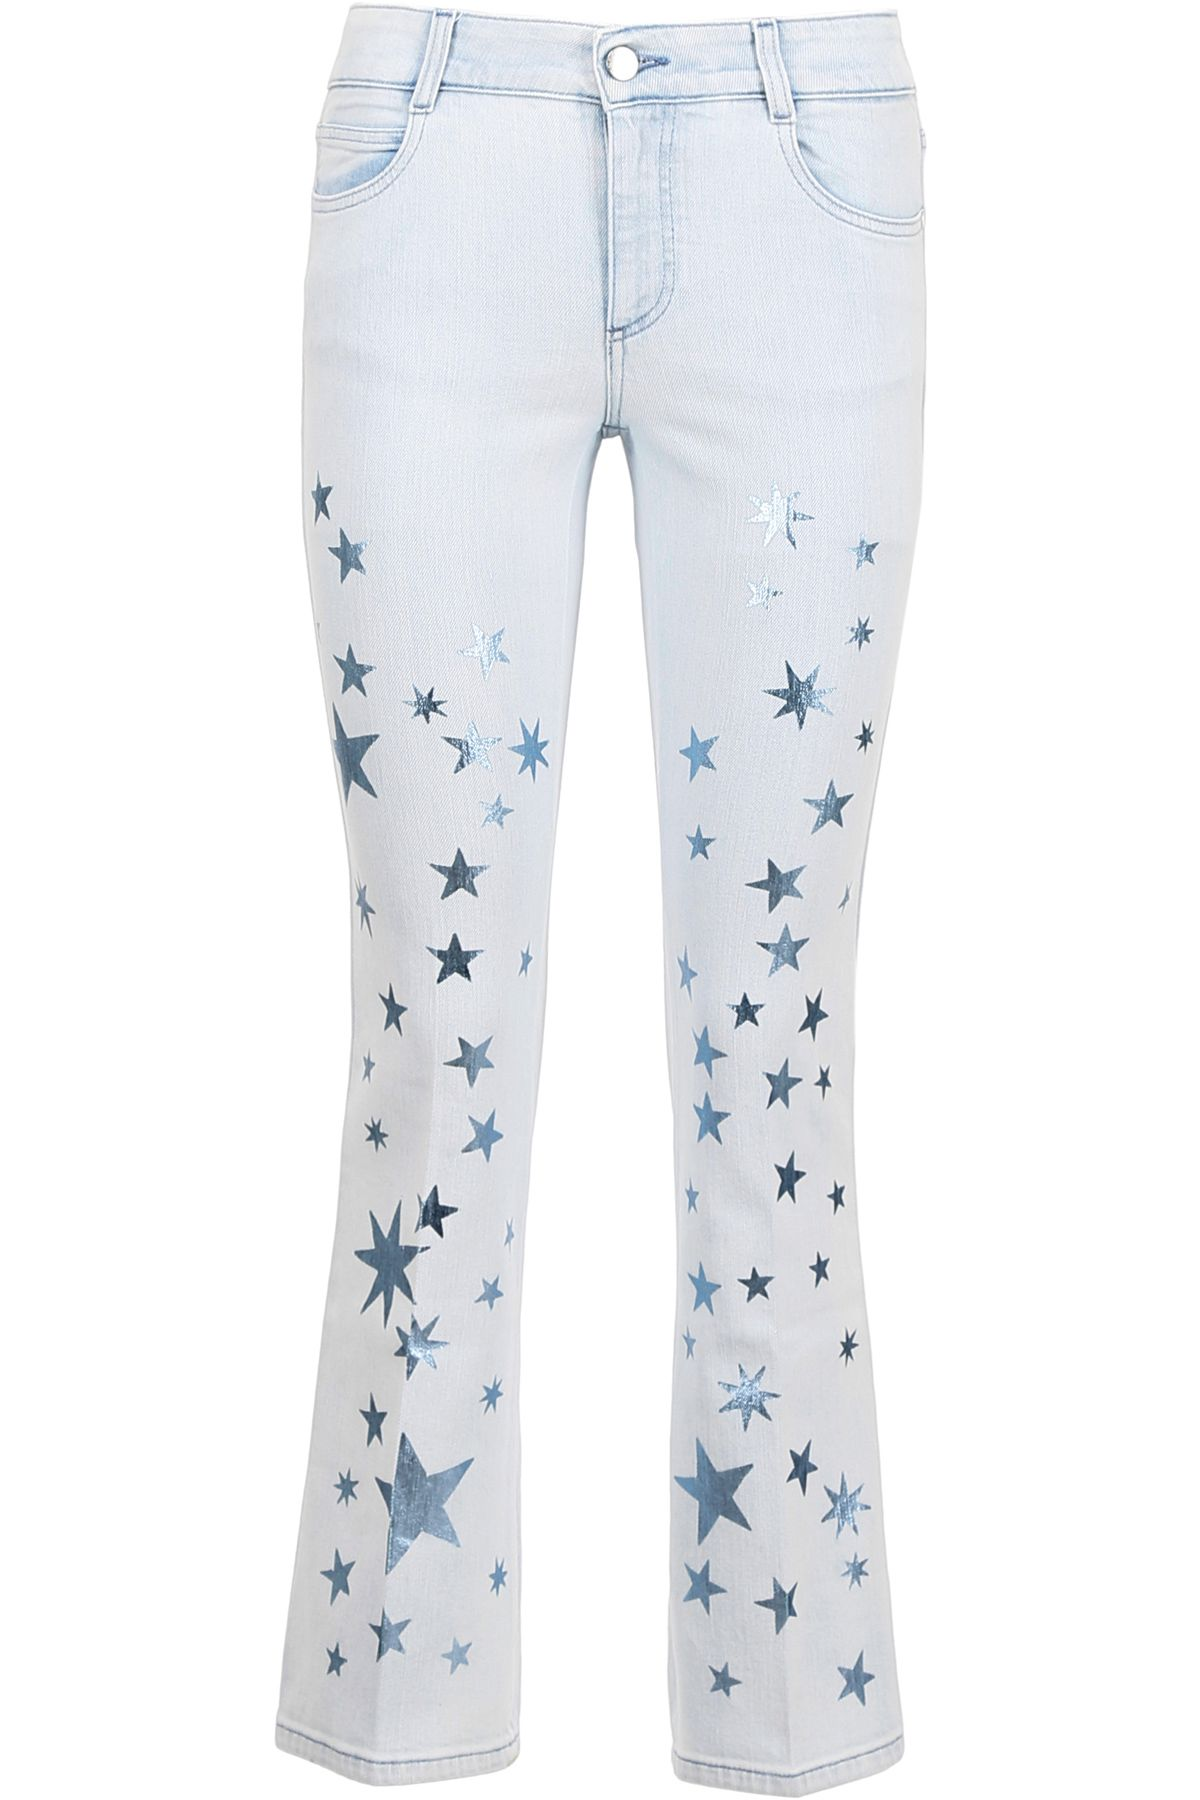 Jeans With Metallic Stars